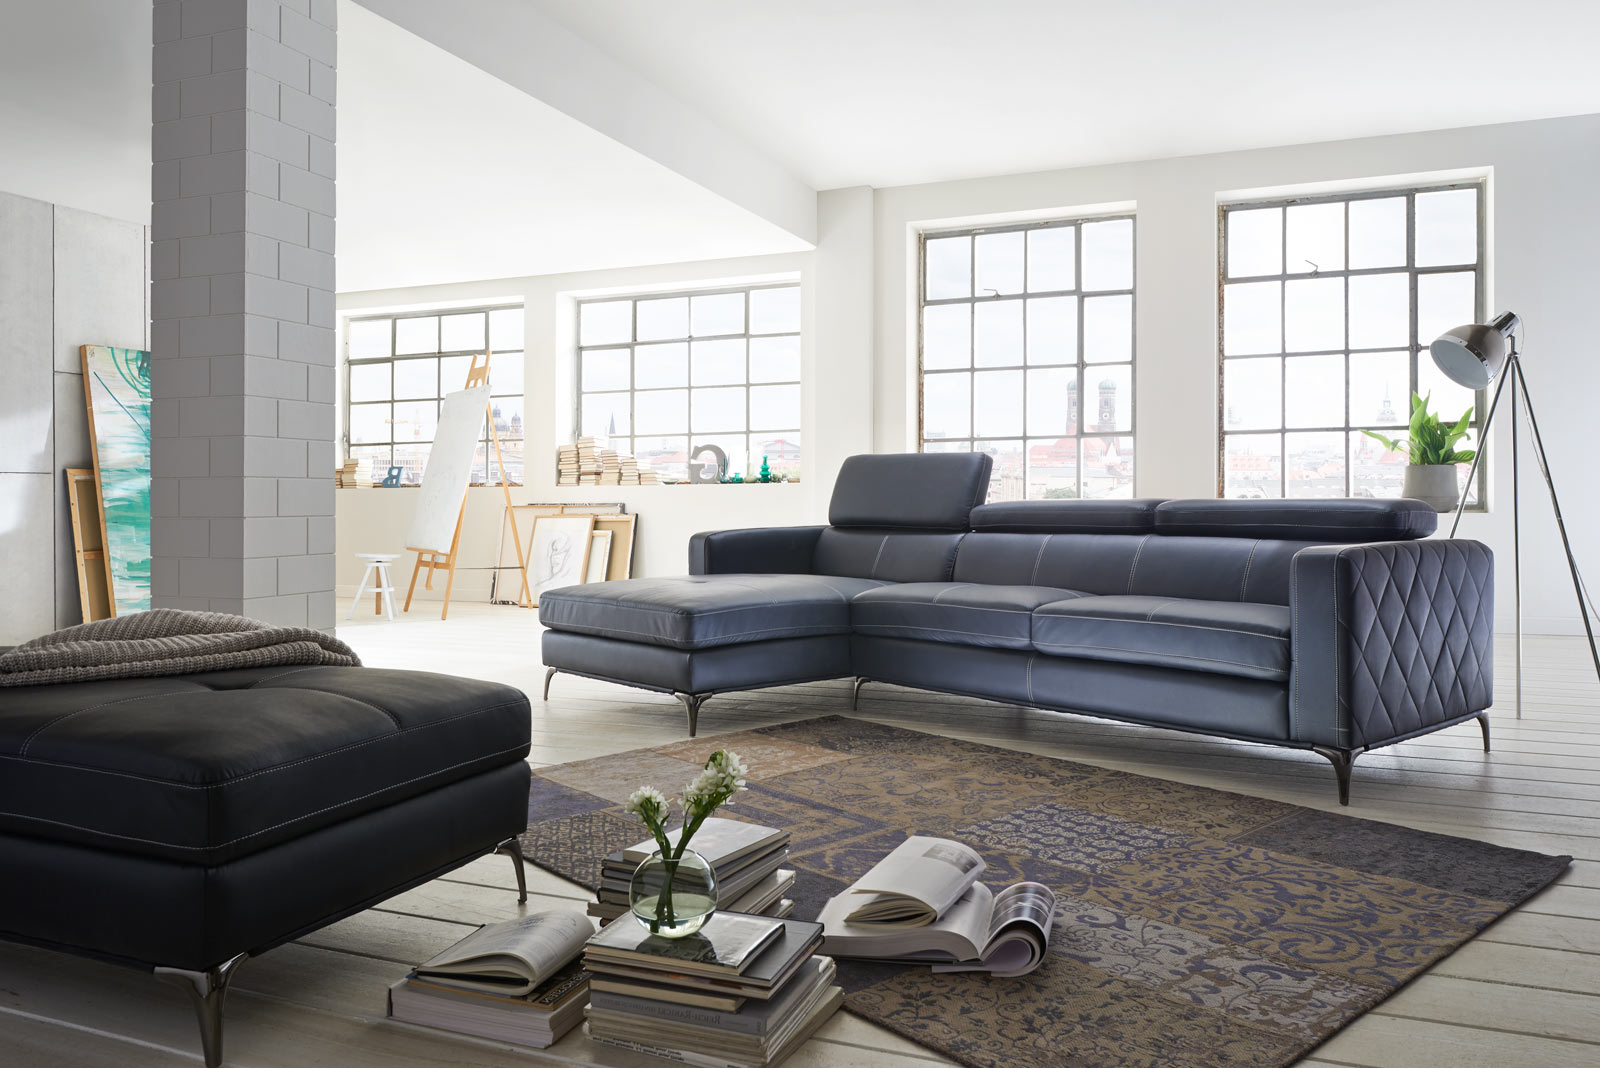 SALE Sofa Couch Ecksofa anthrazit Ottomane links 300 x 132 cm Dario